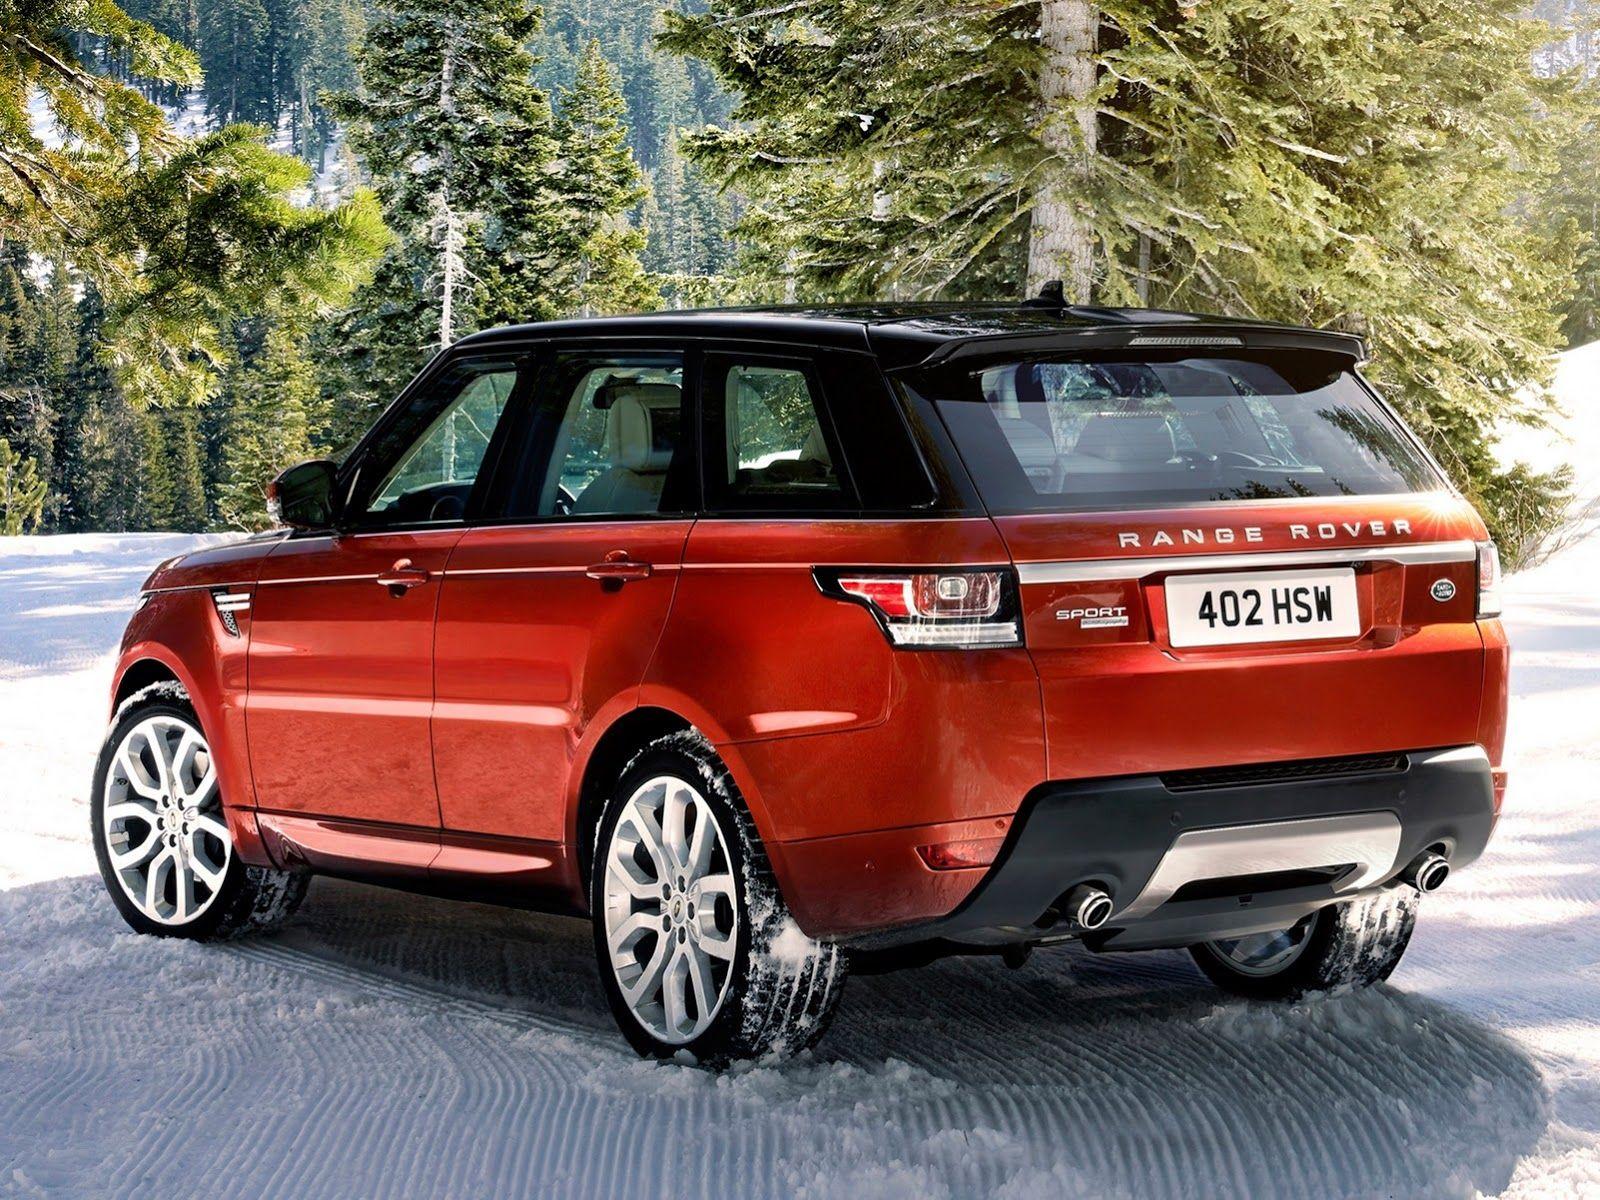 2014 Range Rover Sport Interior 3rd Row